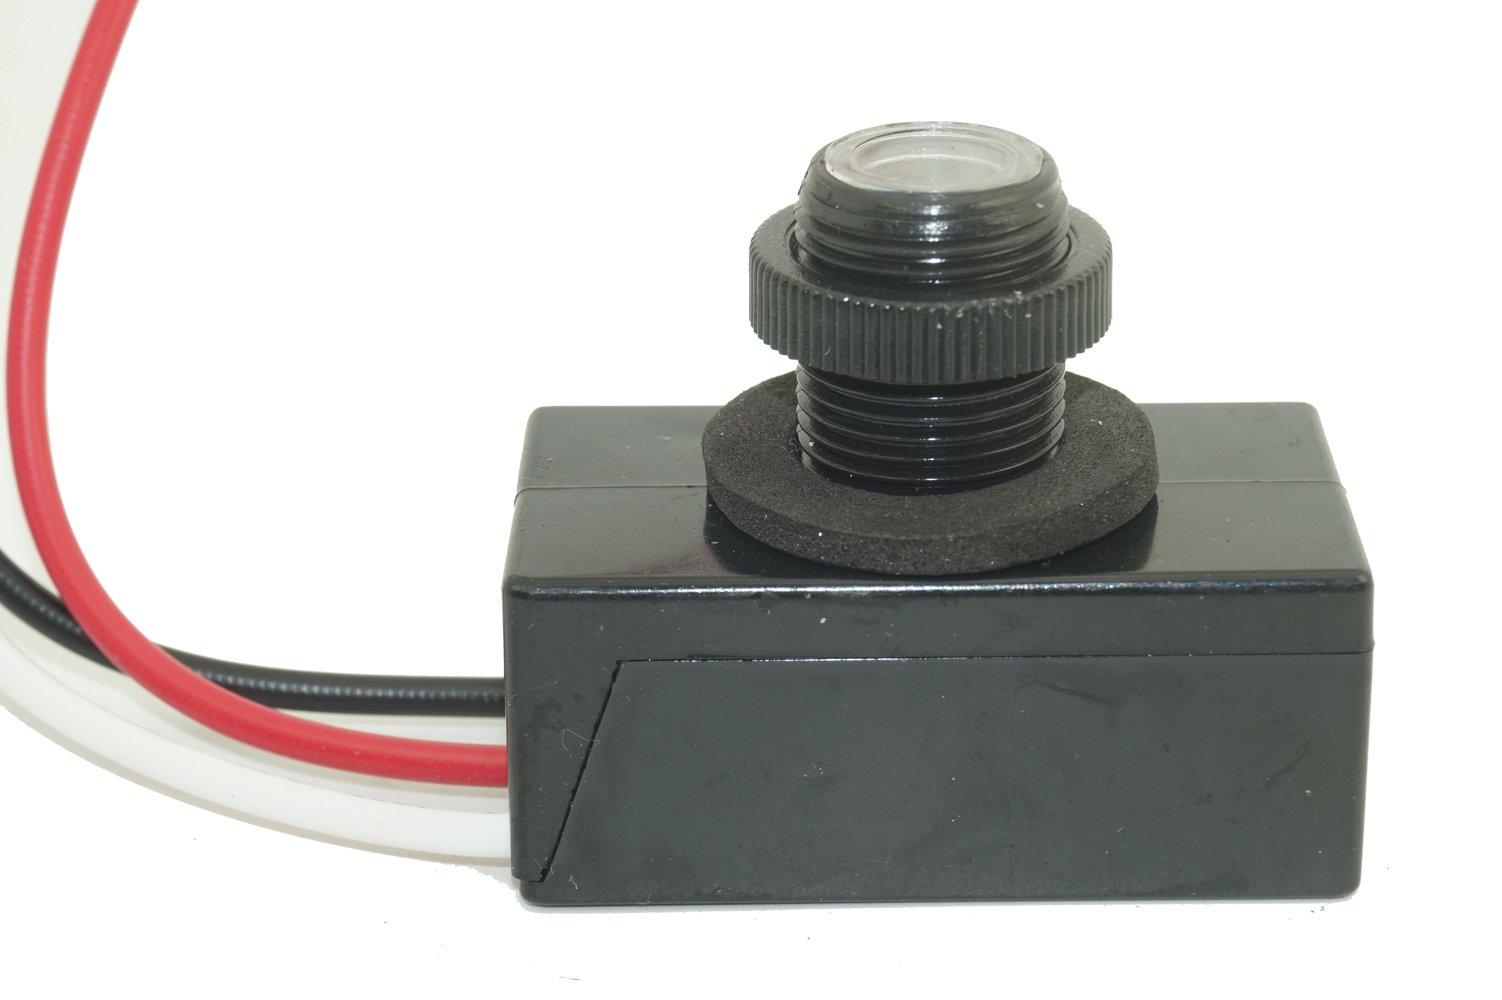 Cheap Photo Eye Sensor For Gate Find Photo Eye Sensor For Gate